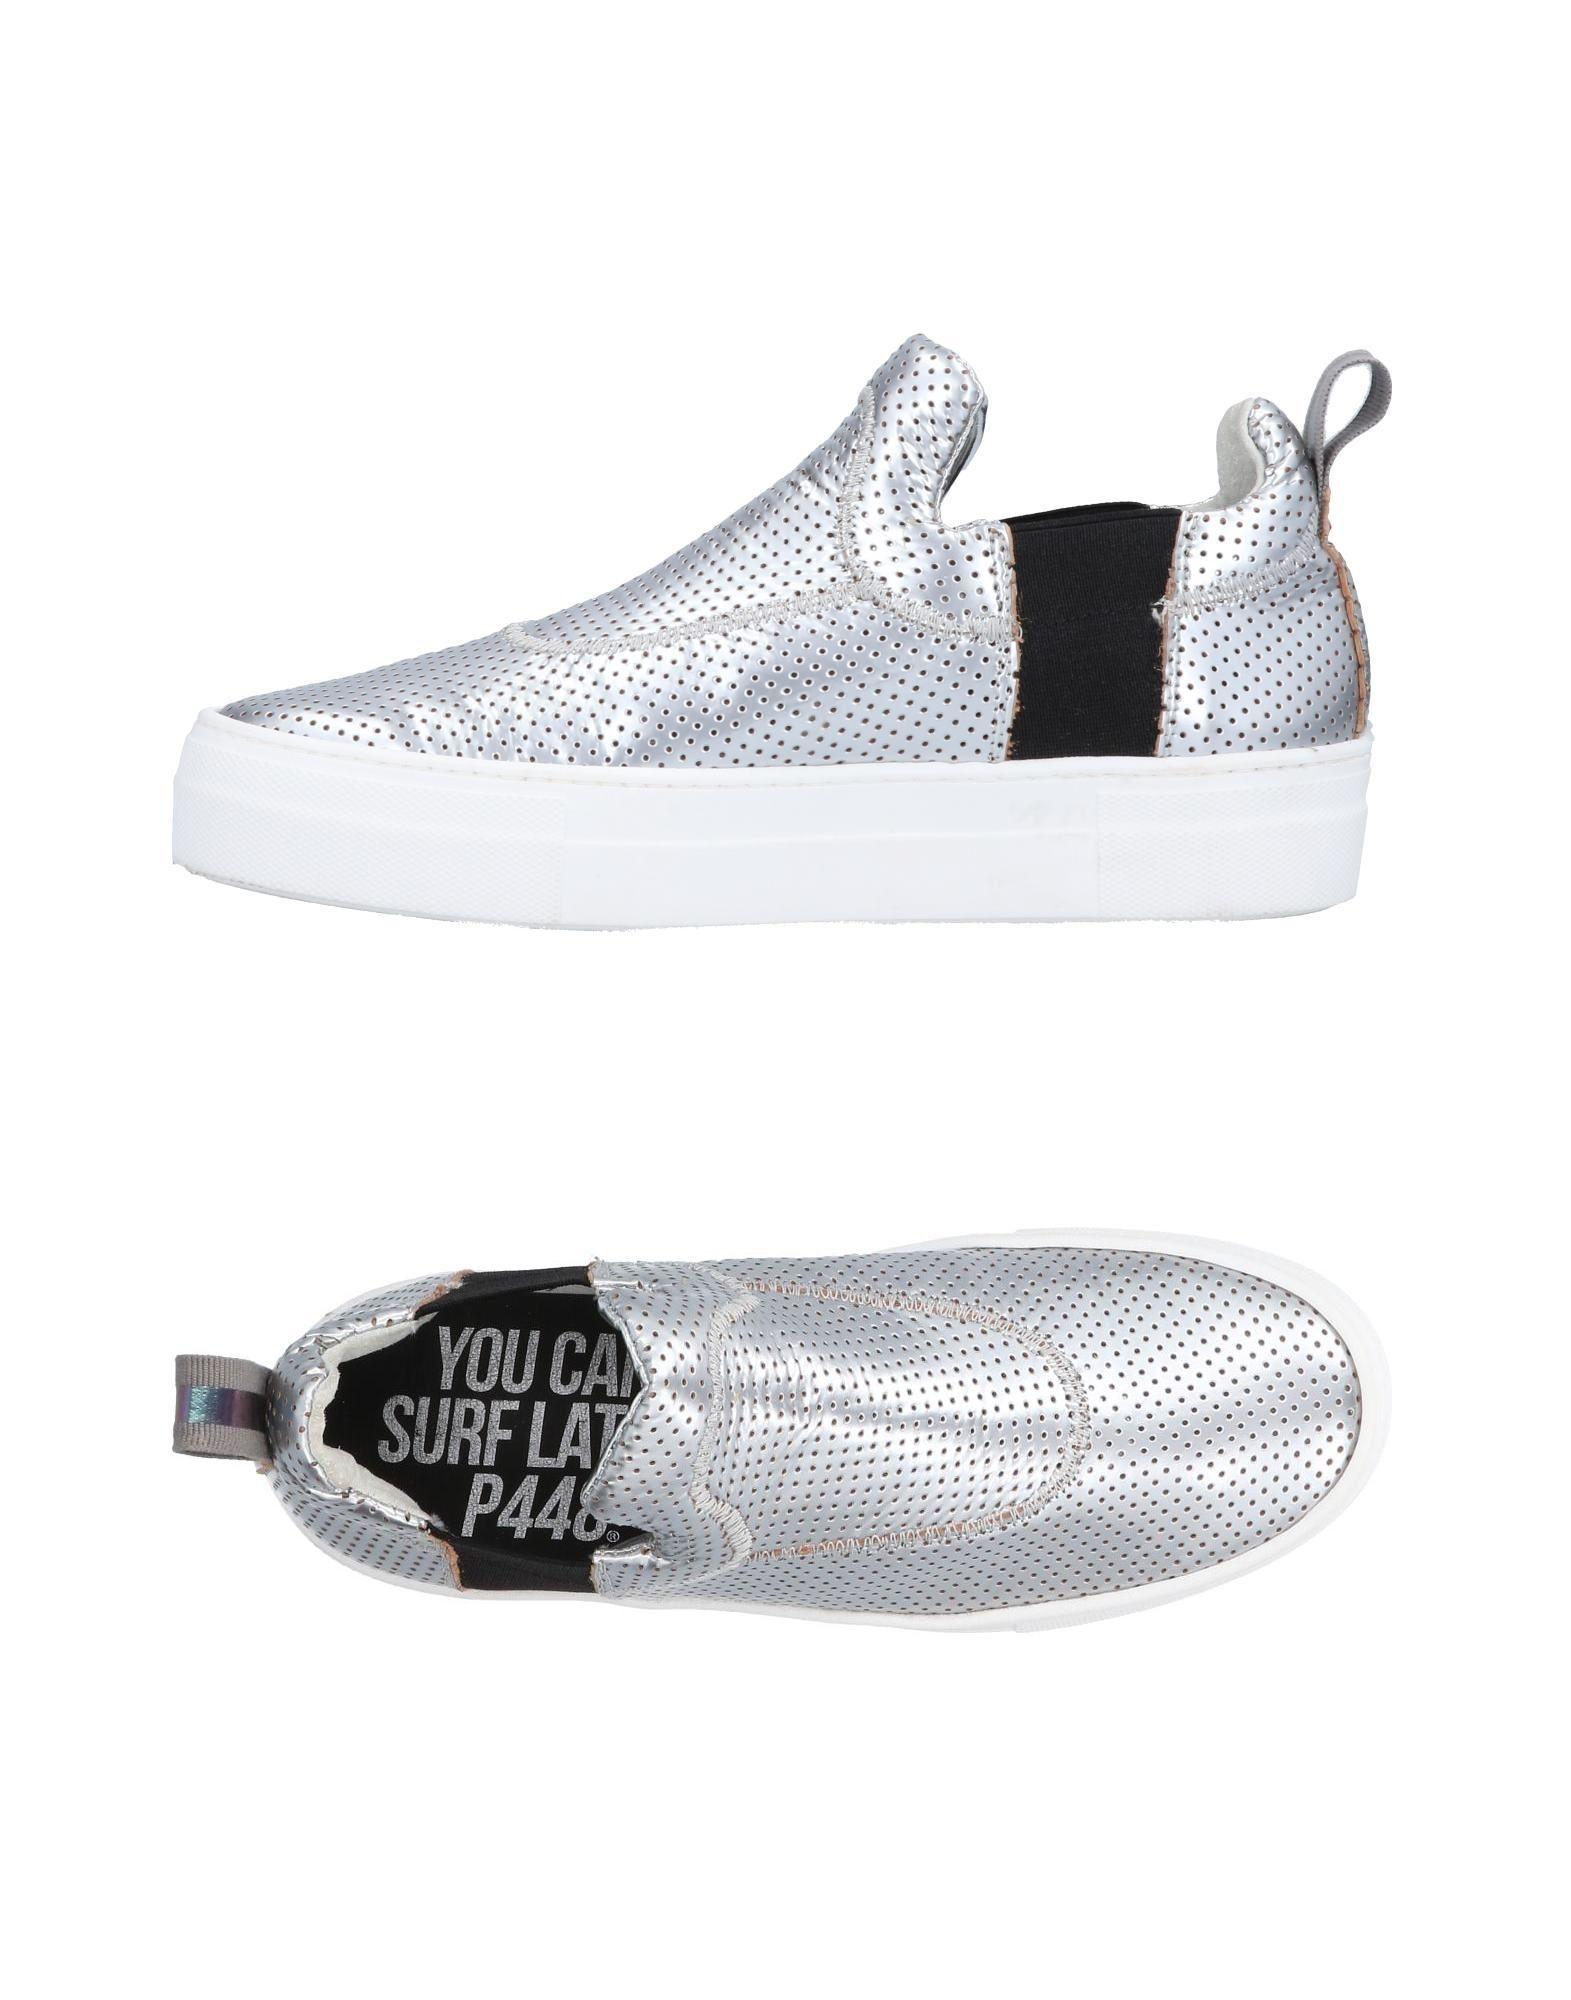 P448 Sneakers - Women Women Women P448 Sneakers online on  United Kingdom - 11501177SO d73b78